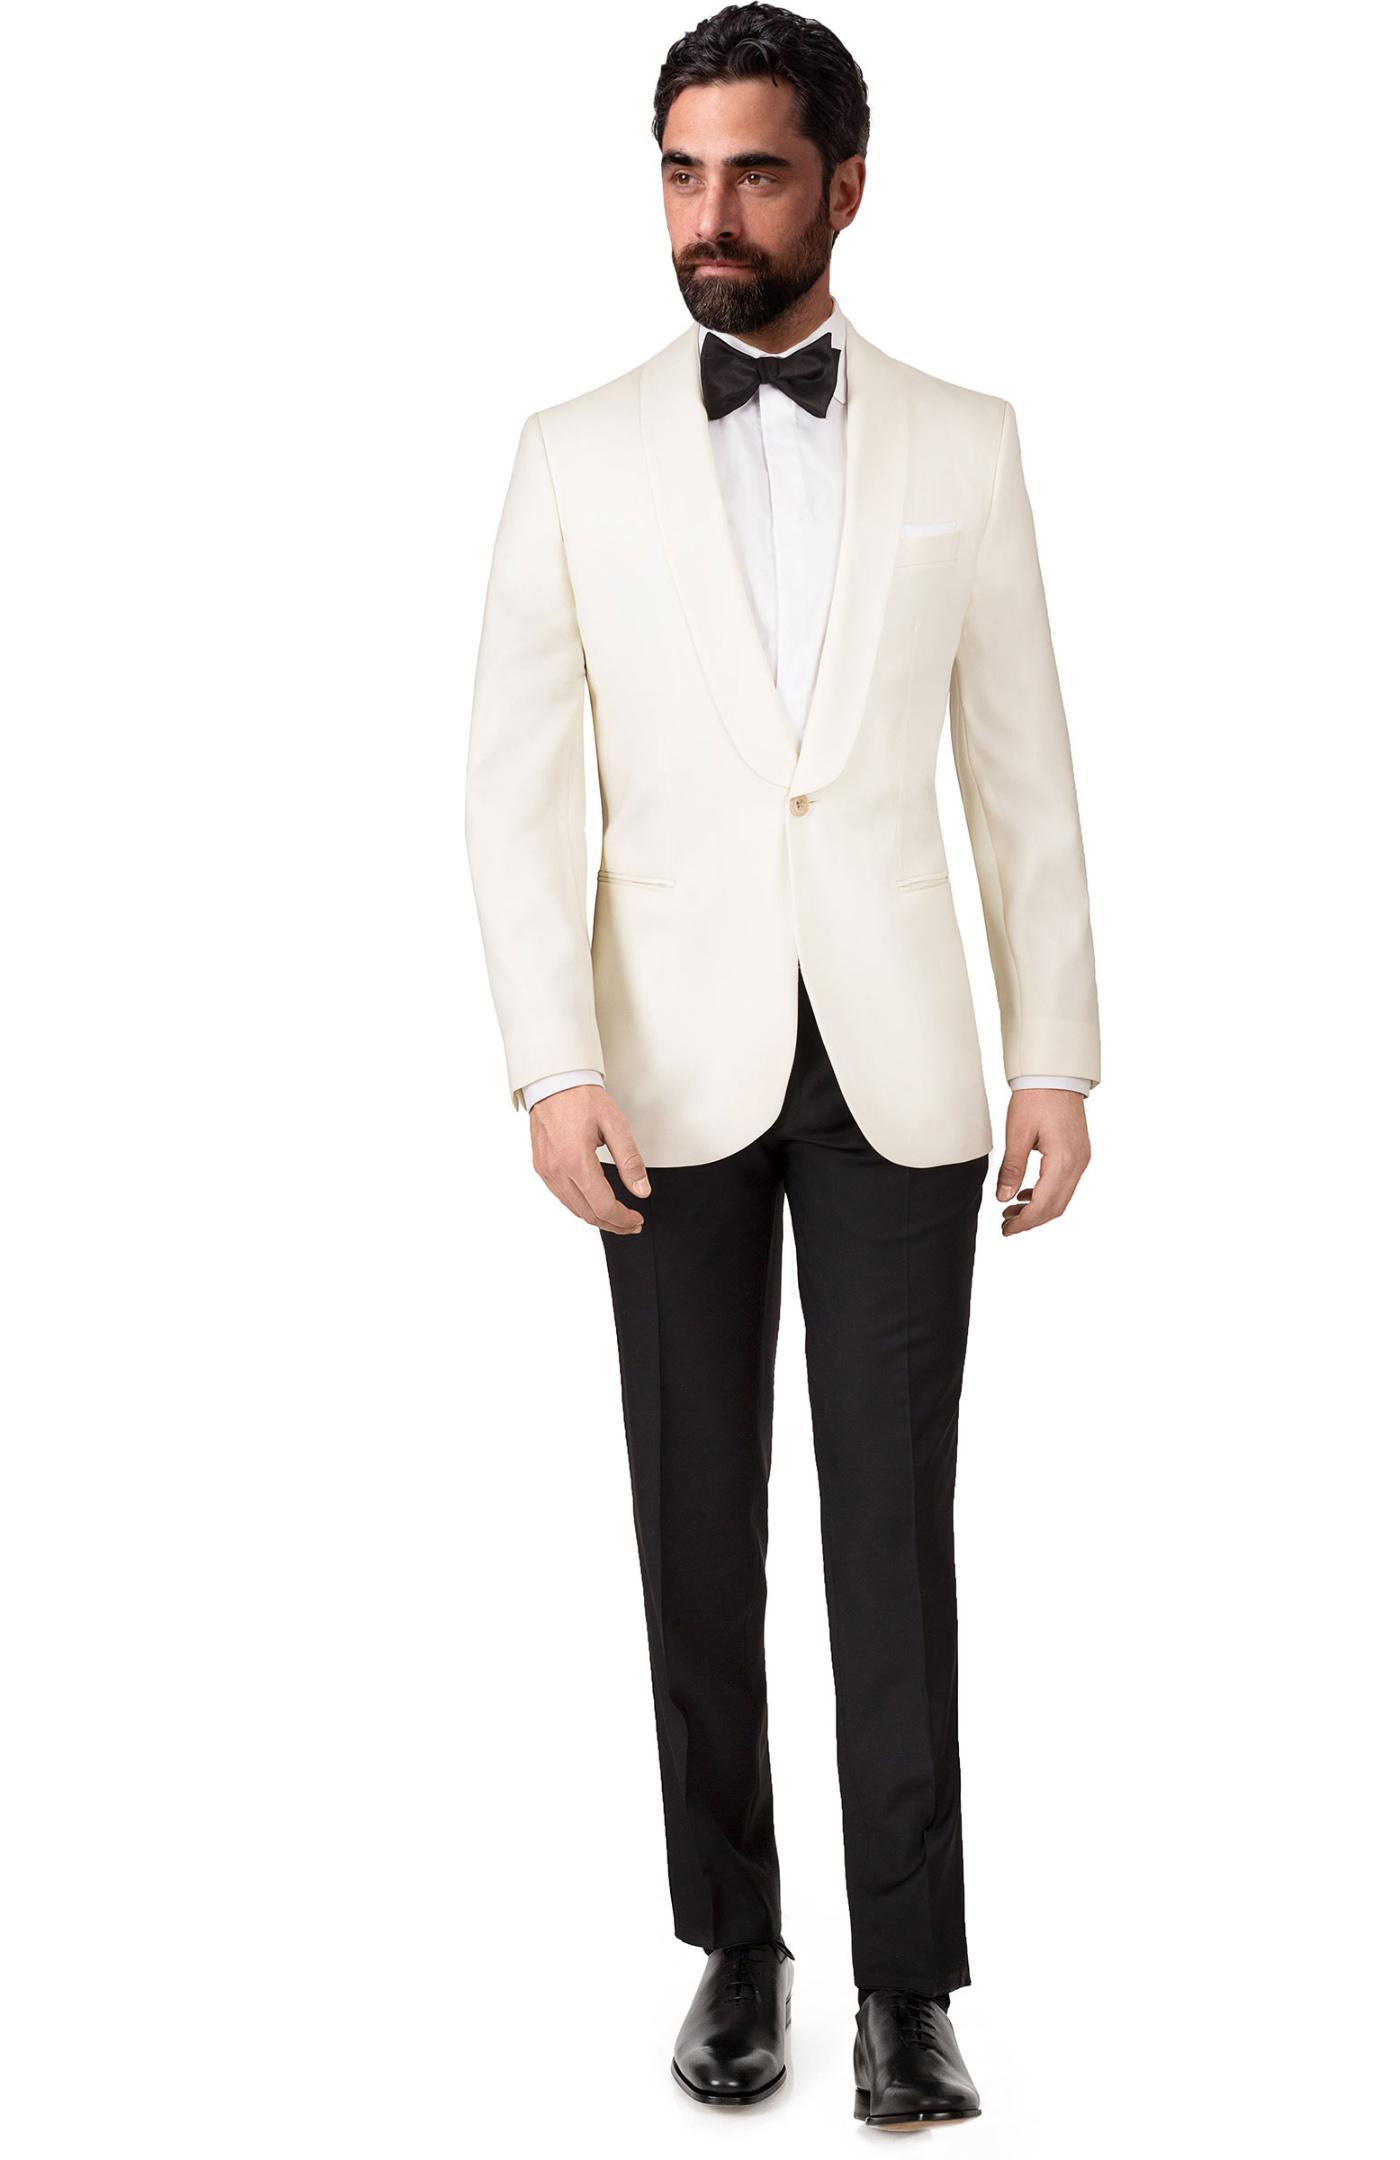 20 Piece Shawl Collar Ivory Tuxedo